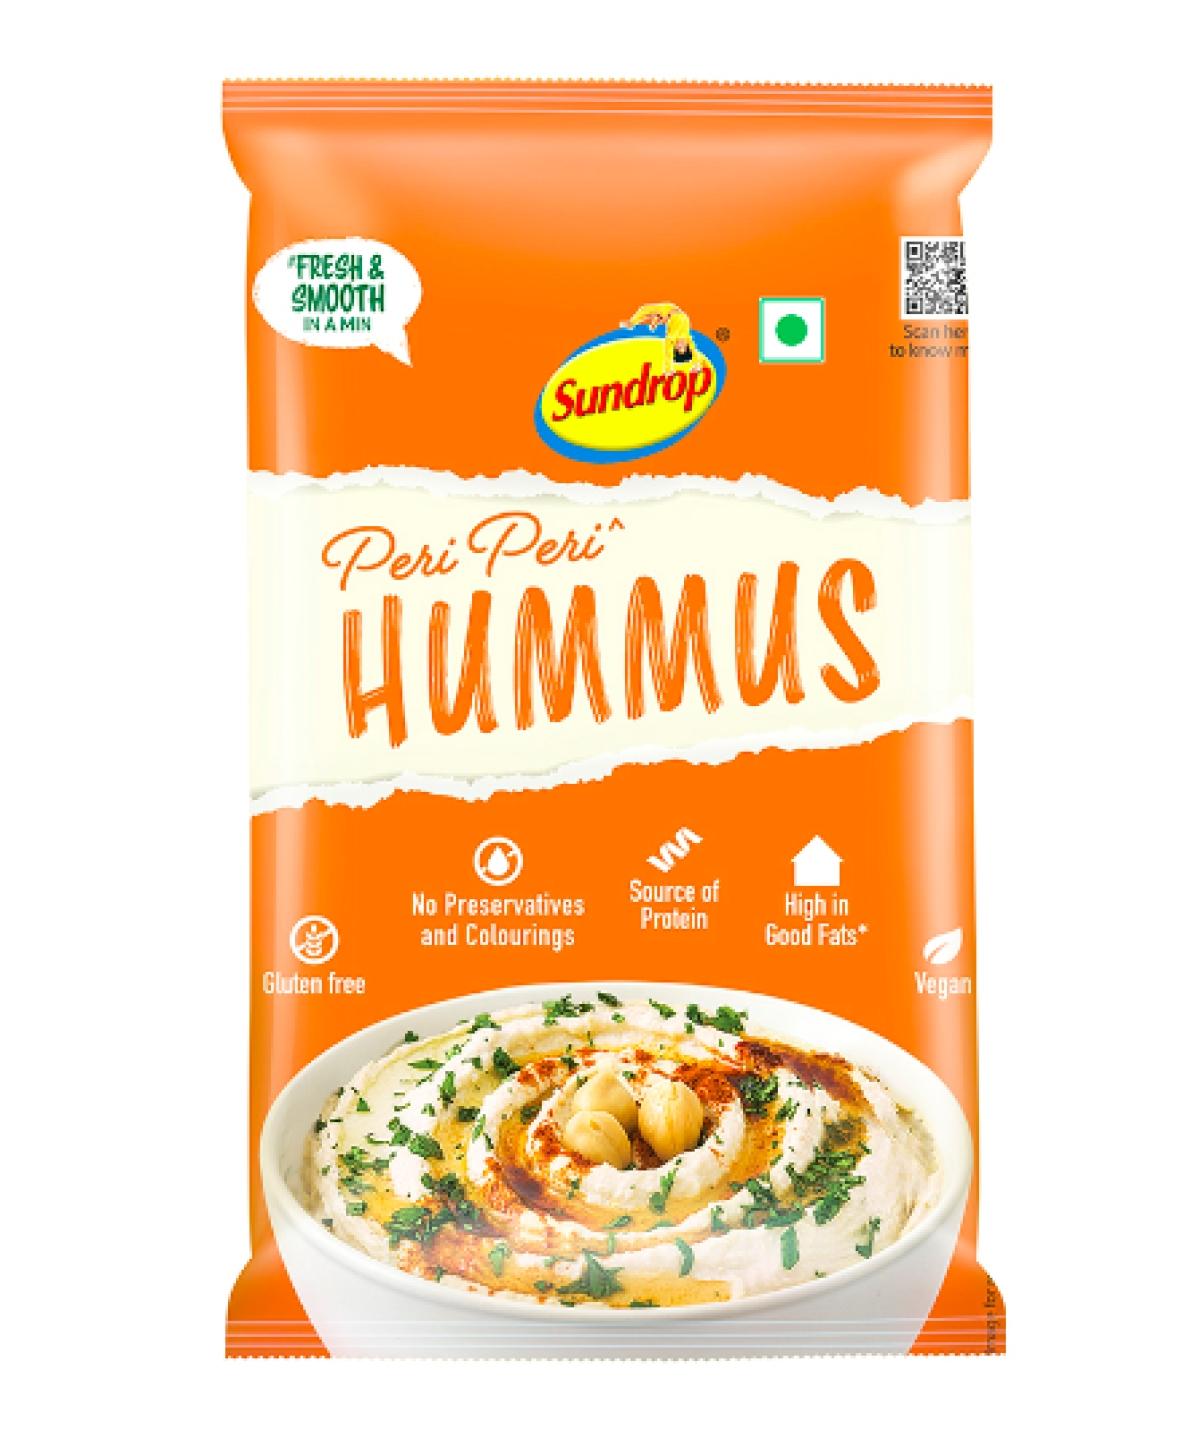 Sundrop's ready to eat 'Peri Peri' hummus